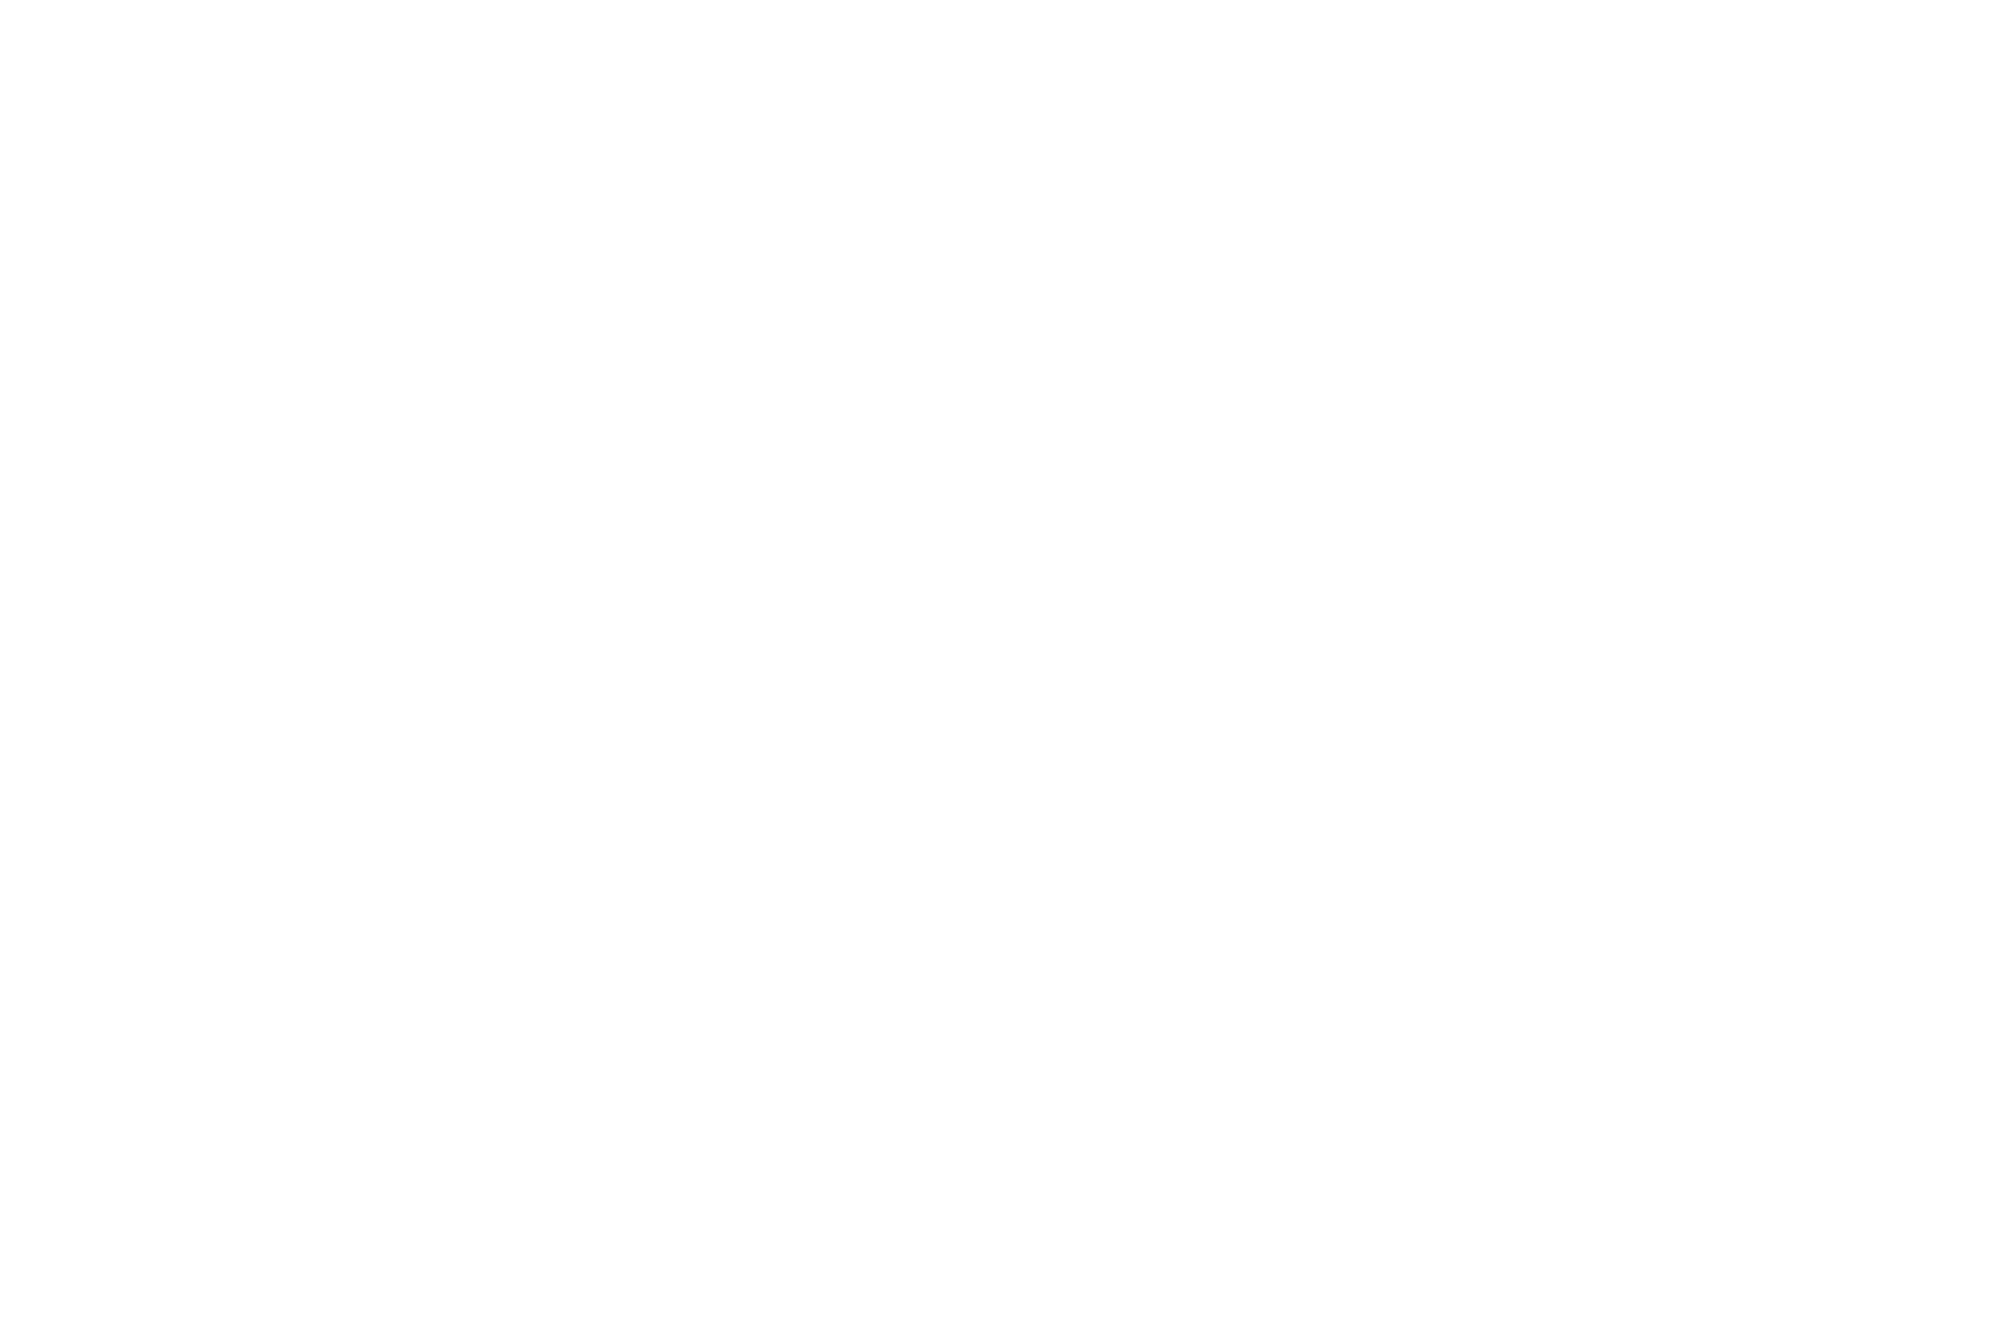 Kv Celcius – Mölndal